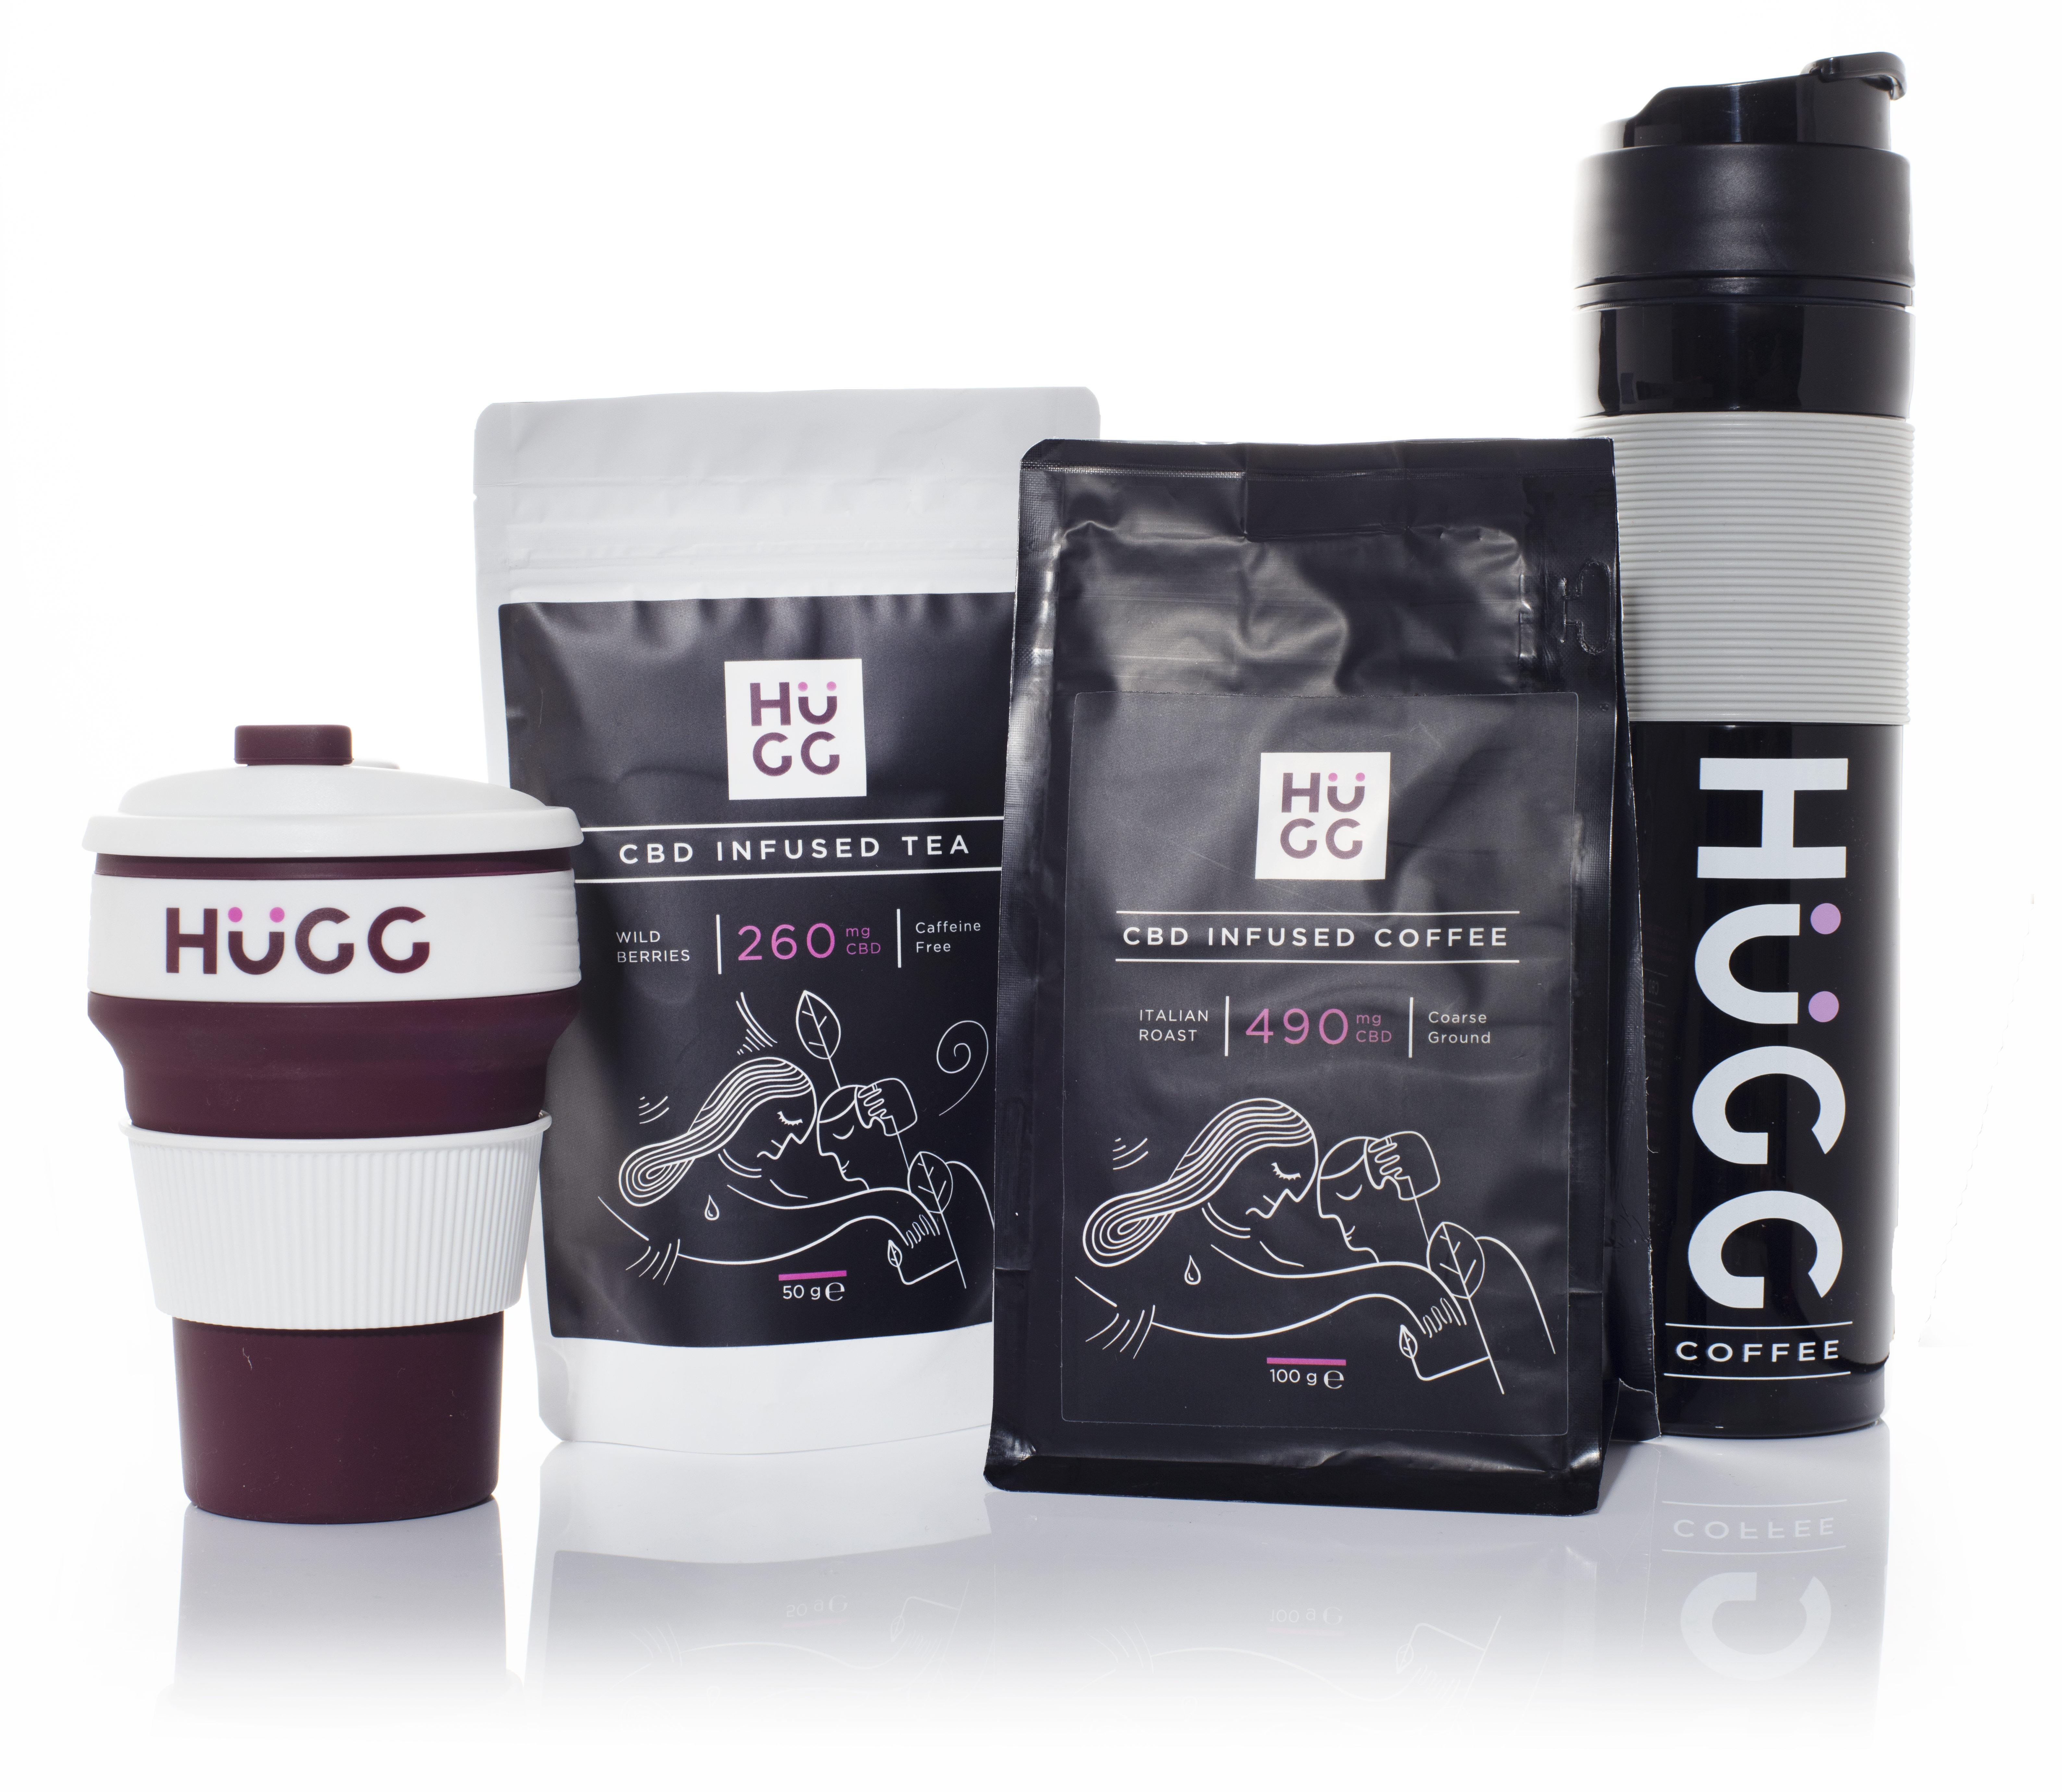 HuGG CBD Coffee & Tea